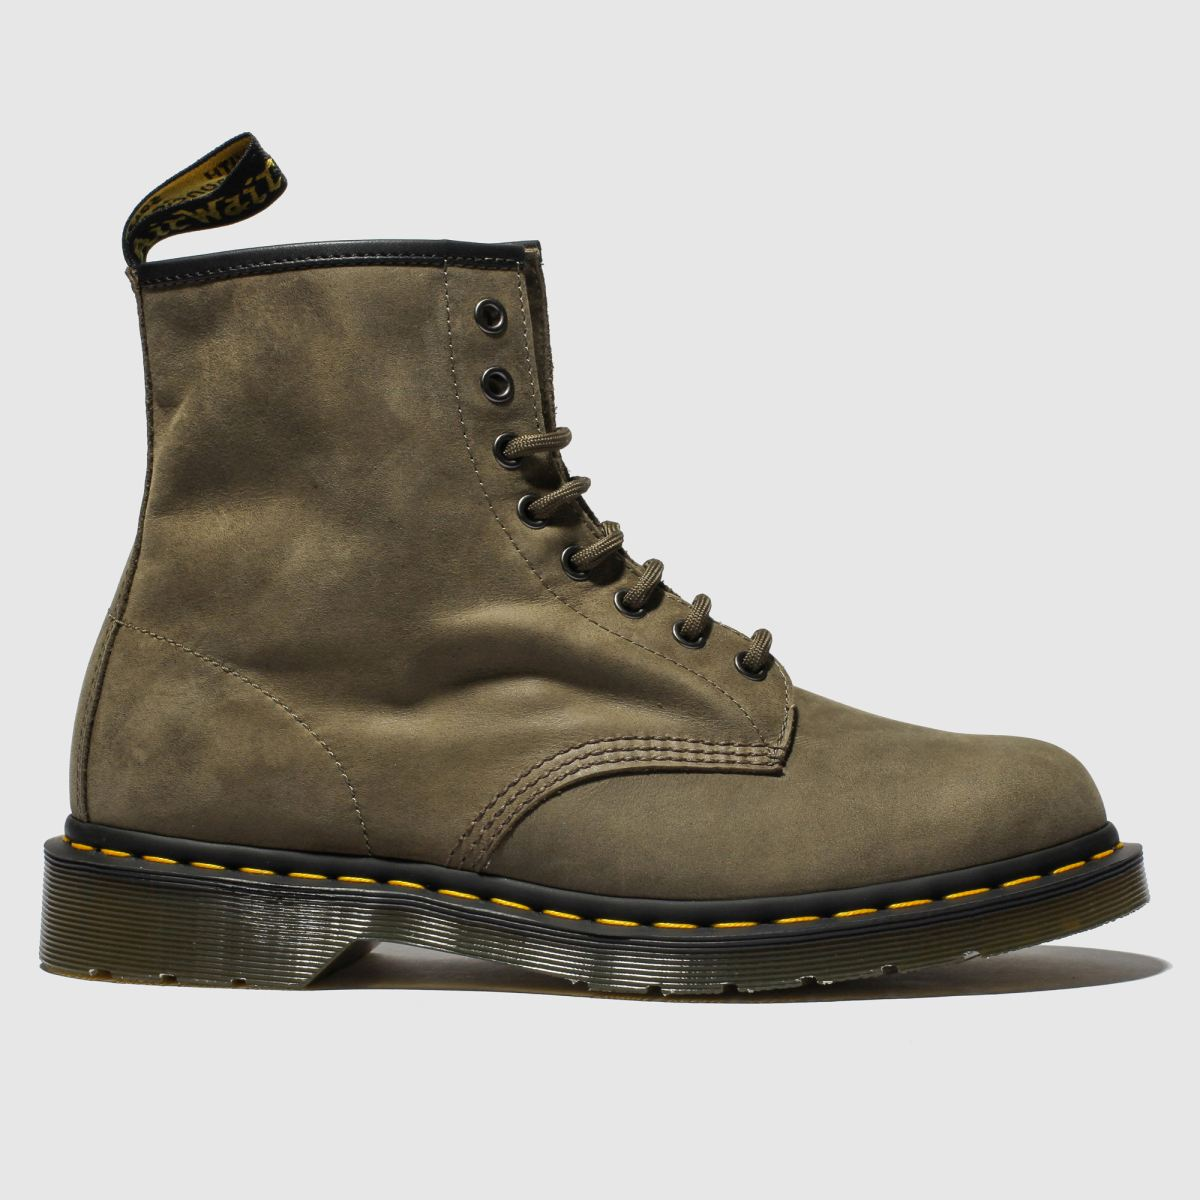 Dr Martens Khaki 1460 8 Eye Boots